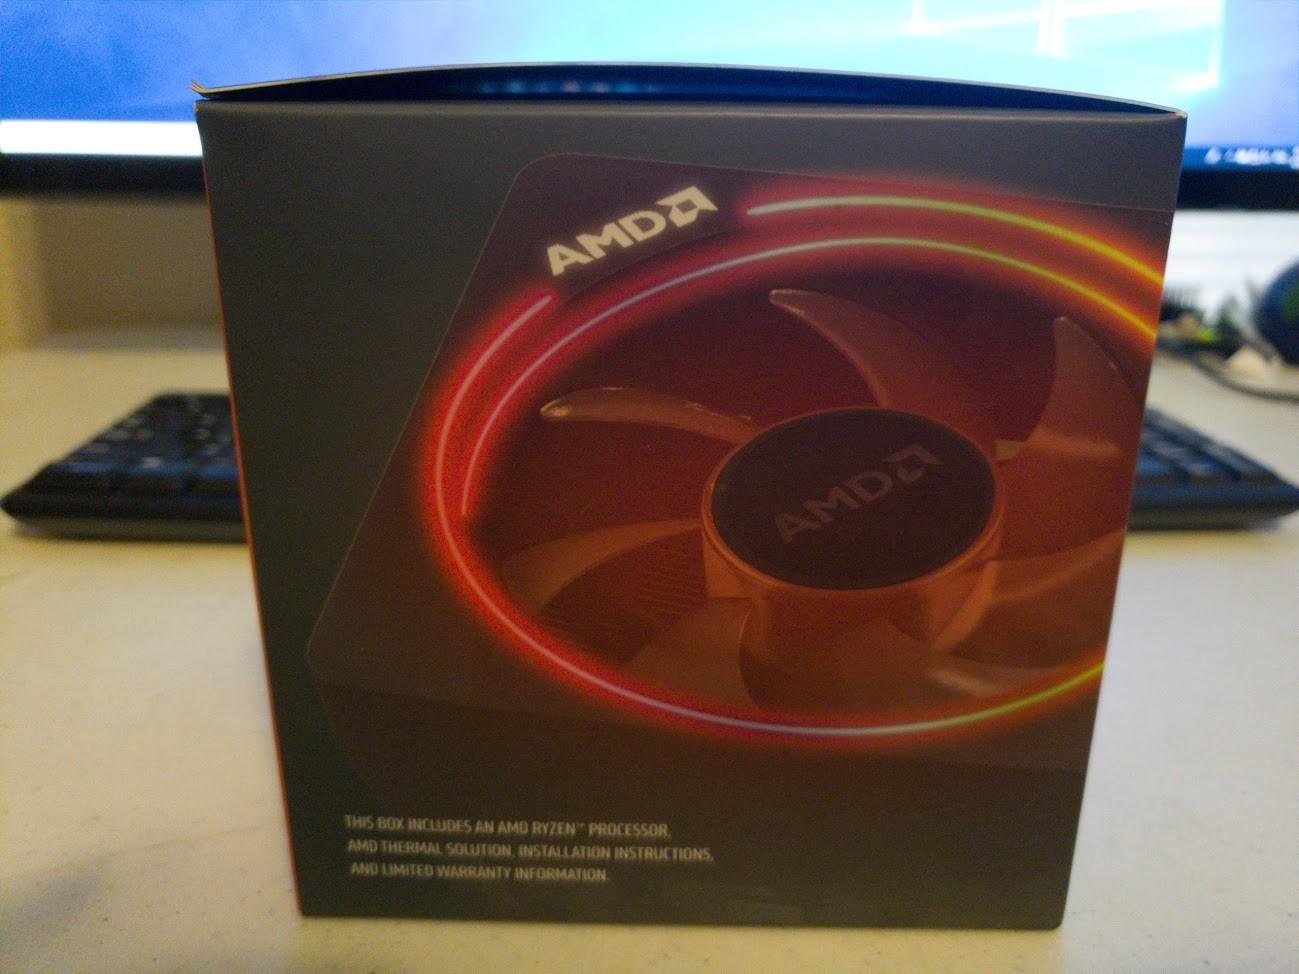 AMD Ryzen 7 2700X - 5